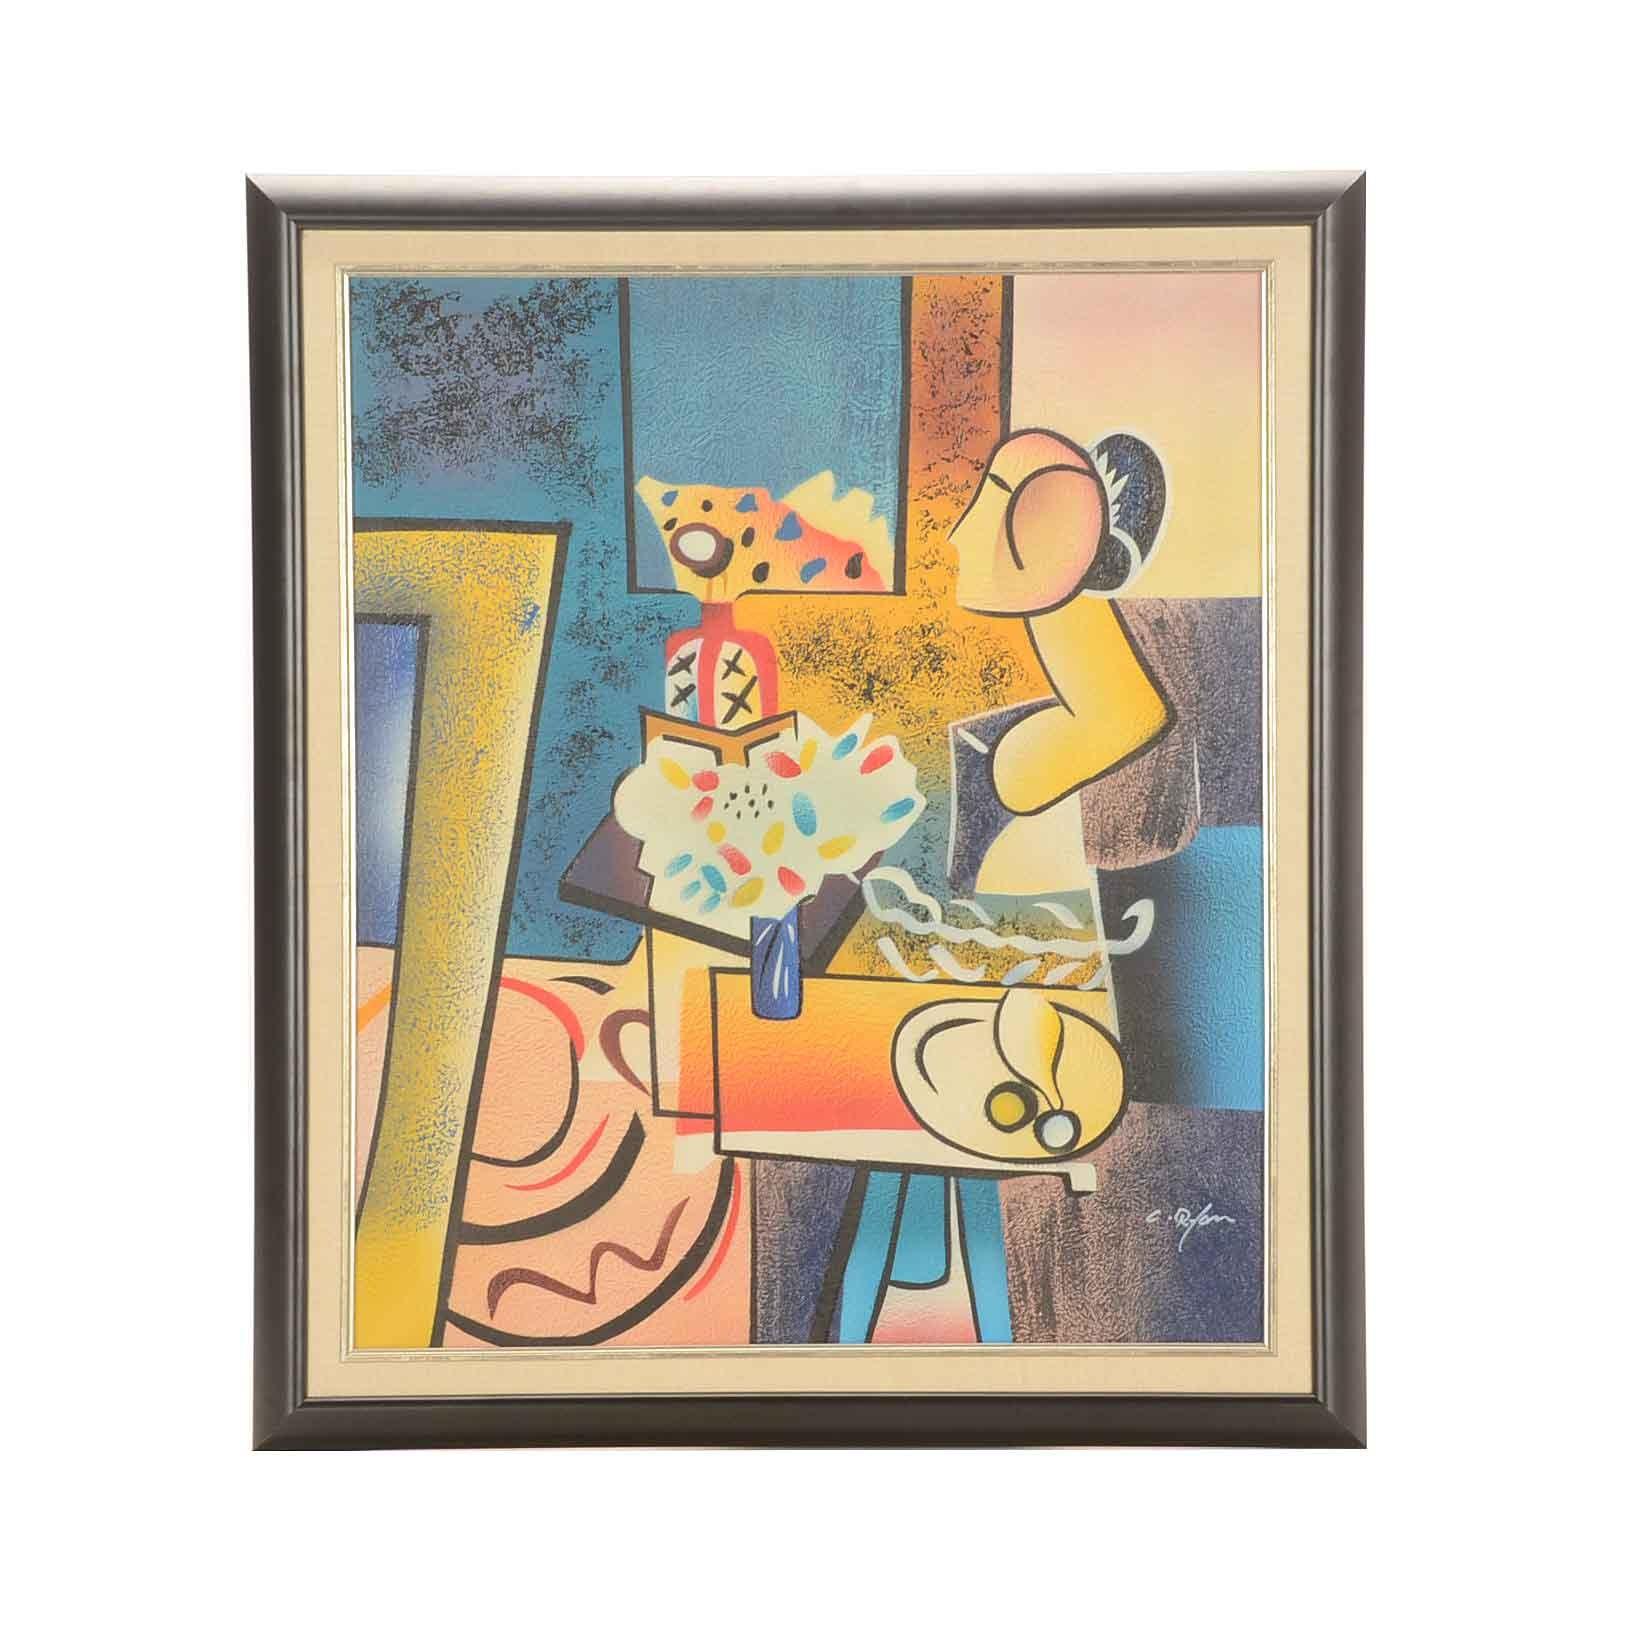 C. Ryan Original Mixed Media Cubist Still Life Painting